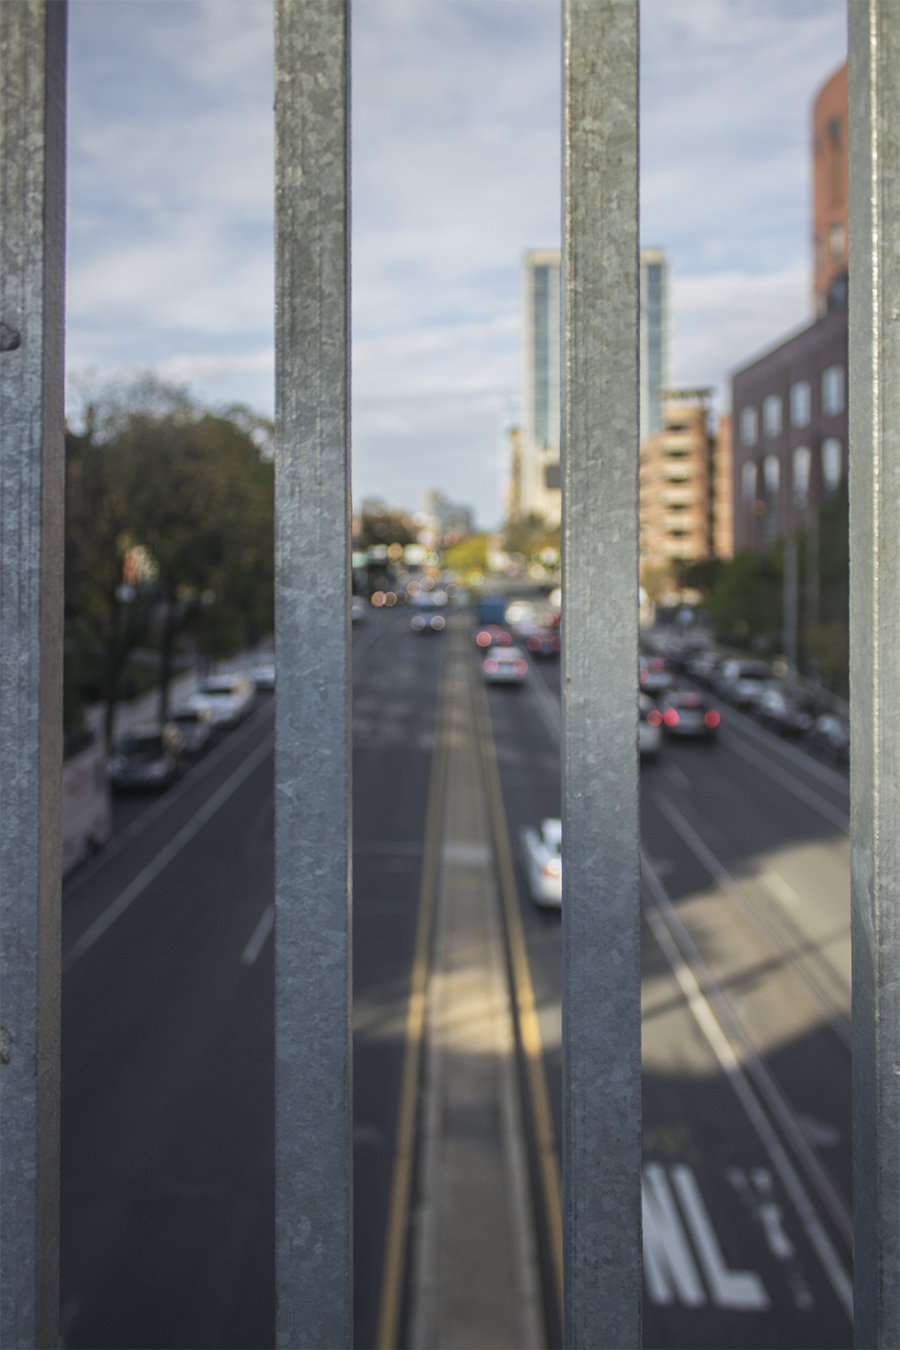 Yash Killa_StillLife_Philadelphia_Pattern_Repetition_Streets_Bridge_Overview_Traffic_Focus_Grill